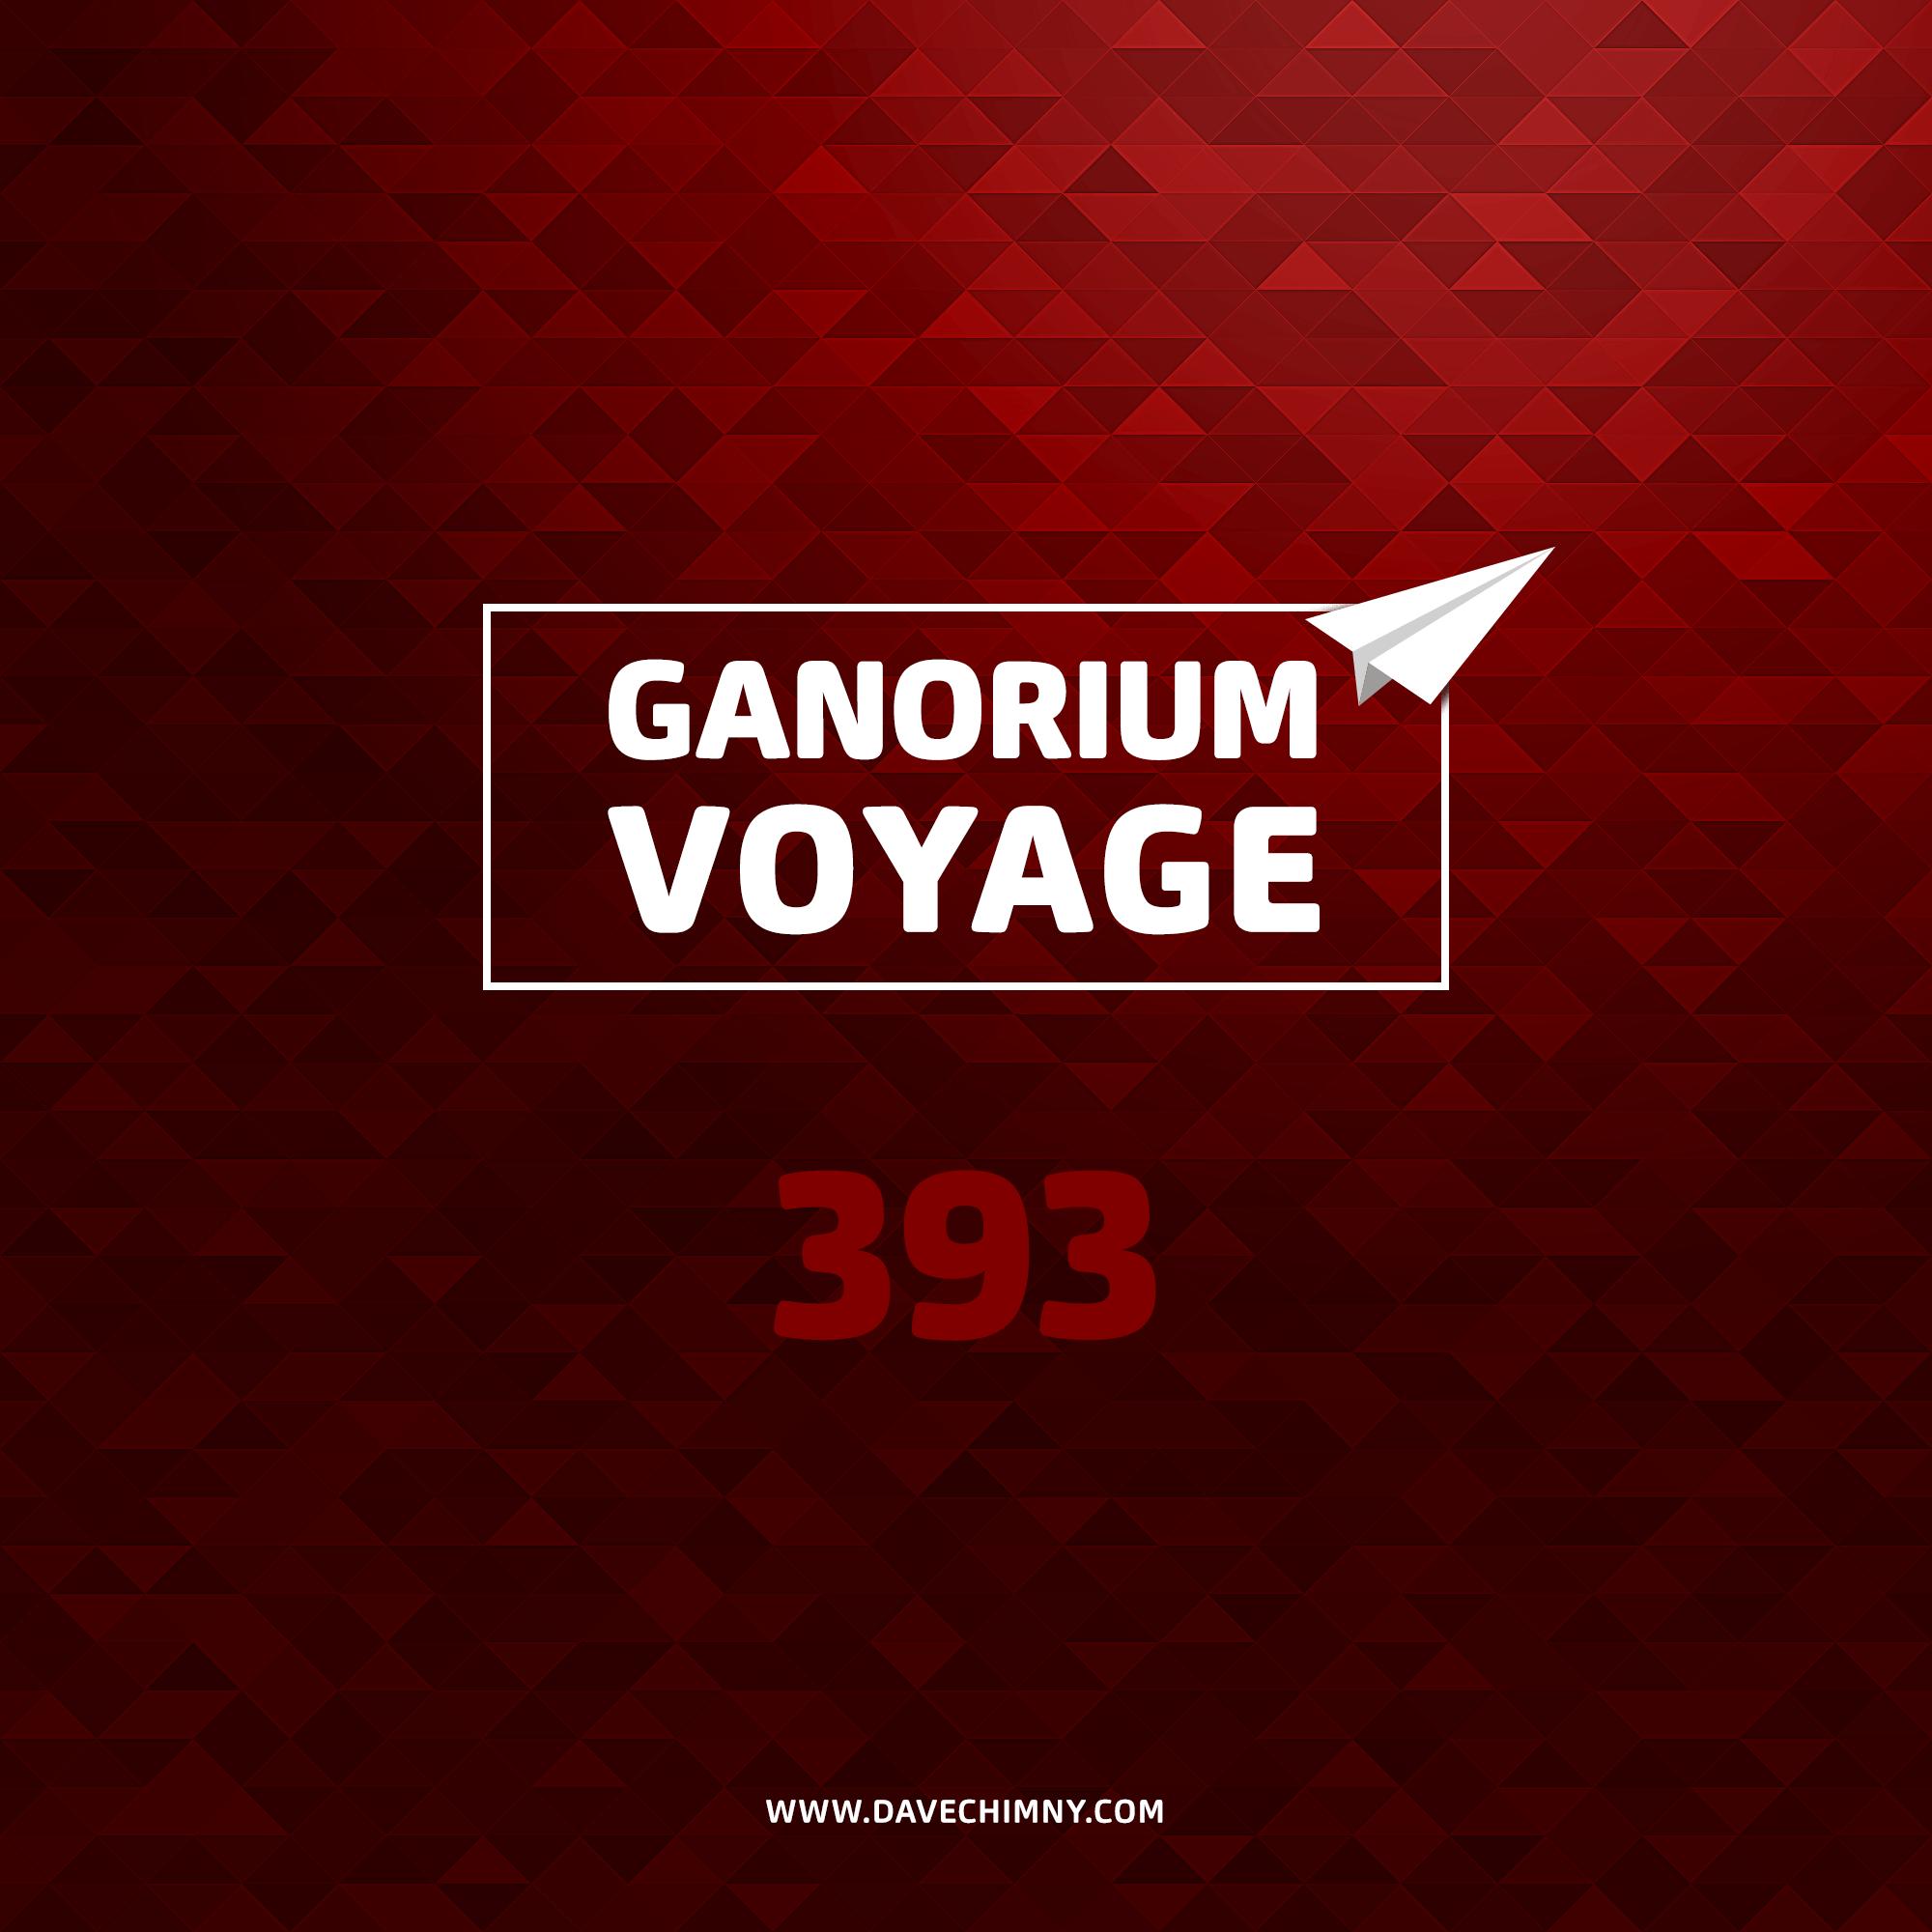 Dave Chimny – Ganorium Voyage 393